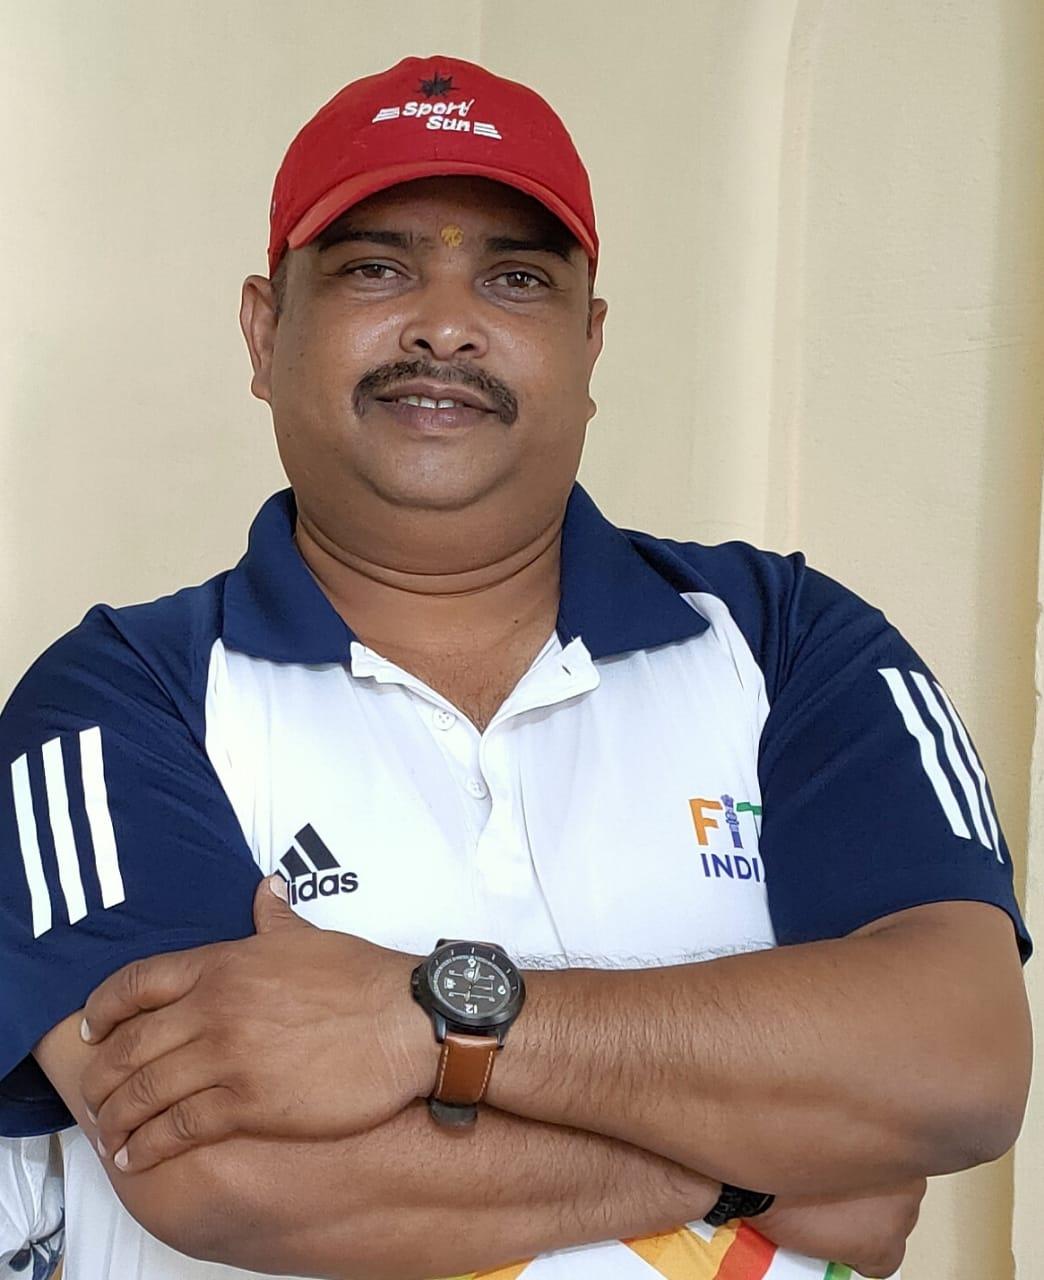 Rajesh Pratap Singh